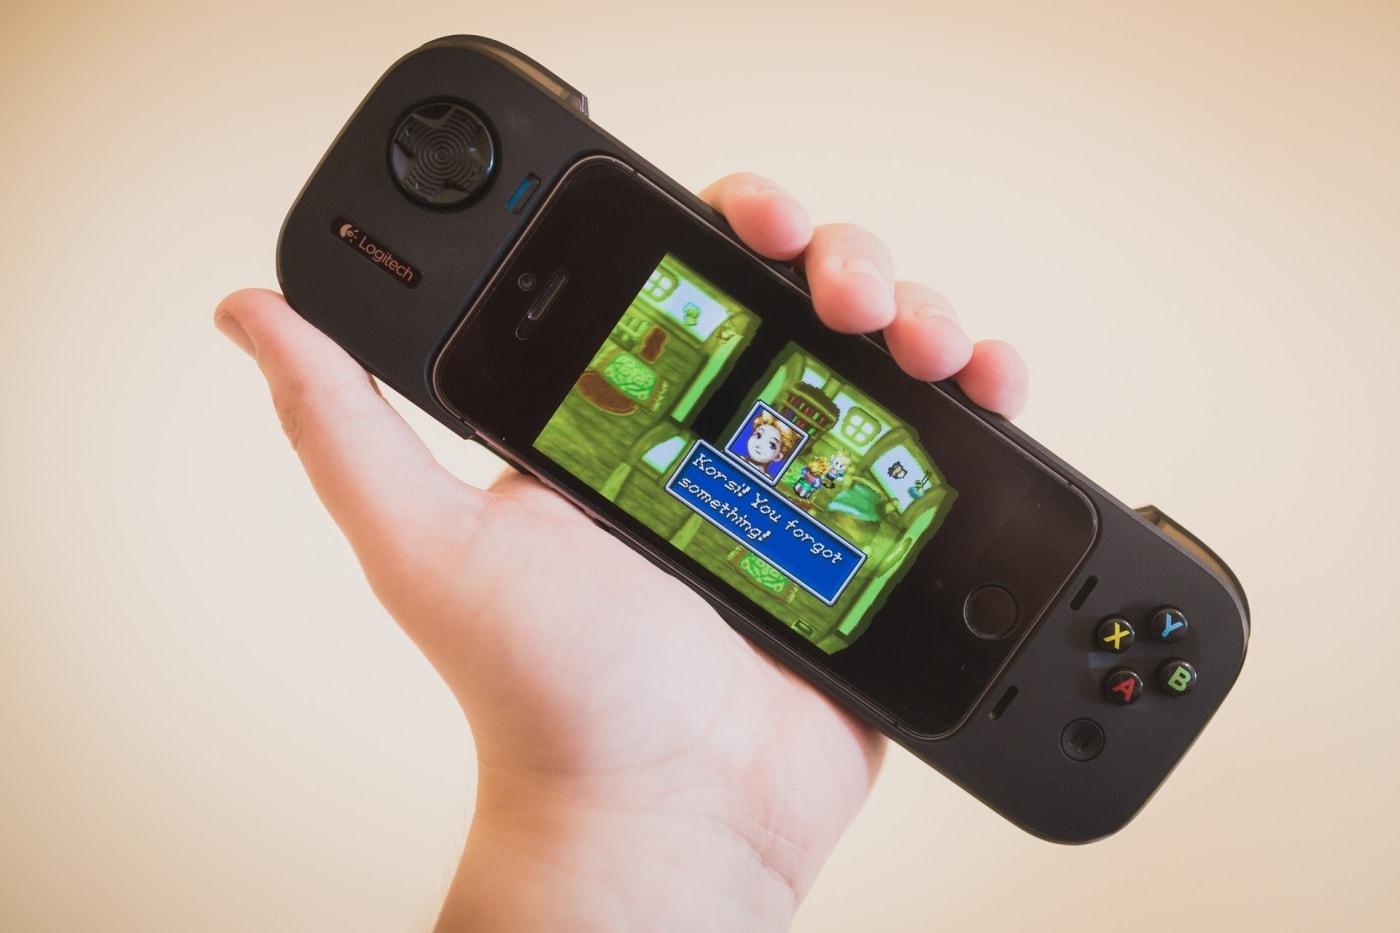 Logitech Game Controller for iOS7